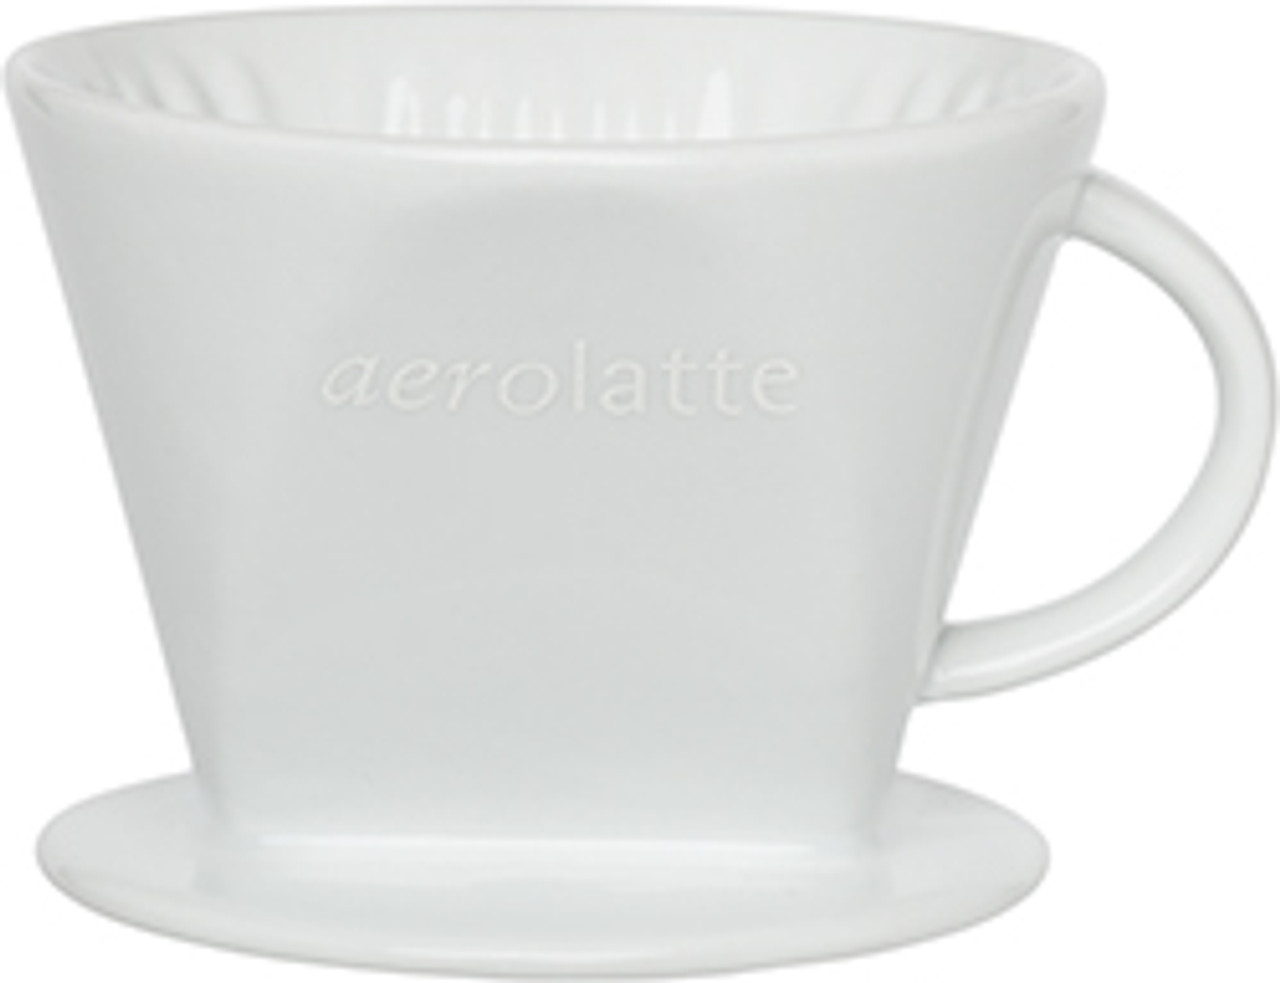 Aerolatte Ceramic Coffee Filter Cone, 2 Cup